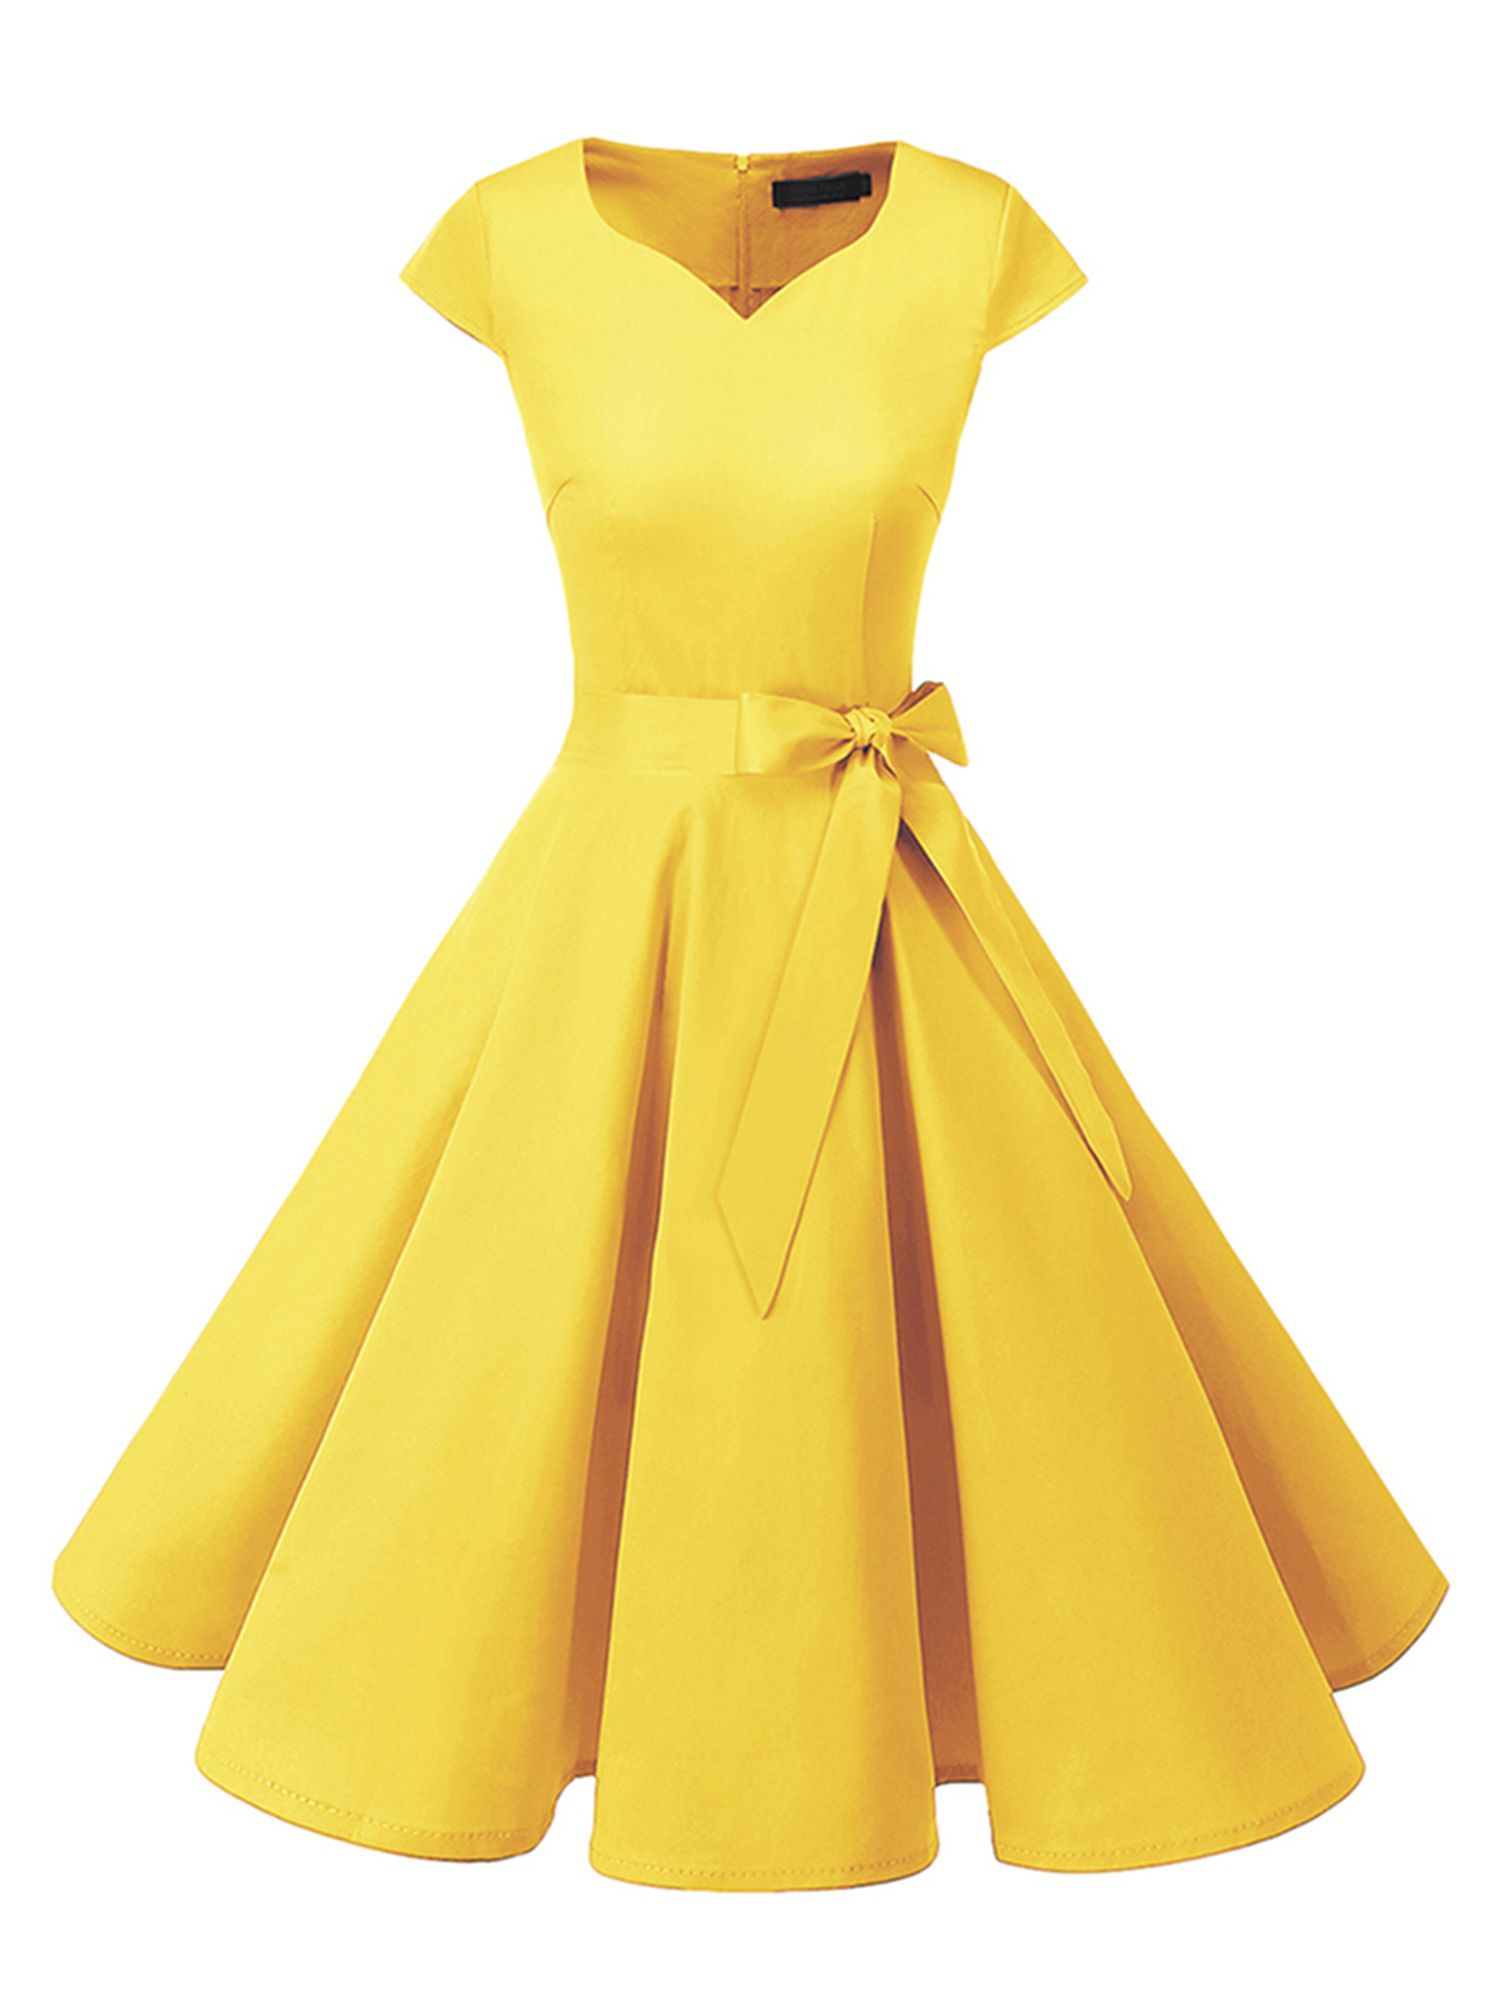 Market In The Box Market In The Box Women S 50s Vintage Dress Cap Sleeve Rockabilly Swing Dress Floral Polka Dot Cocktail Dress With Belt Walmart Com In 2020 Vintage Dresses [ 2000 x 1500 Pixel ]